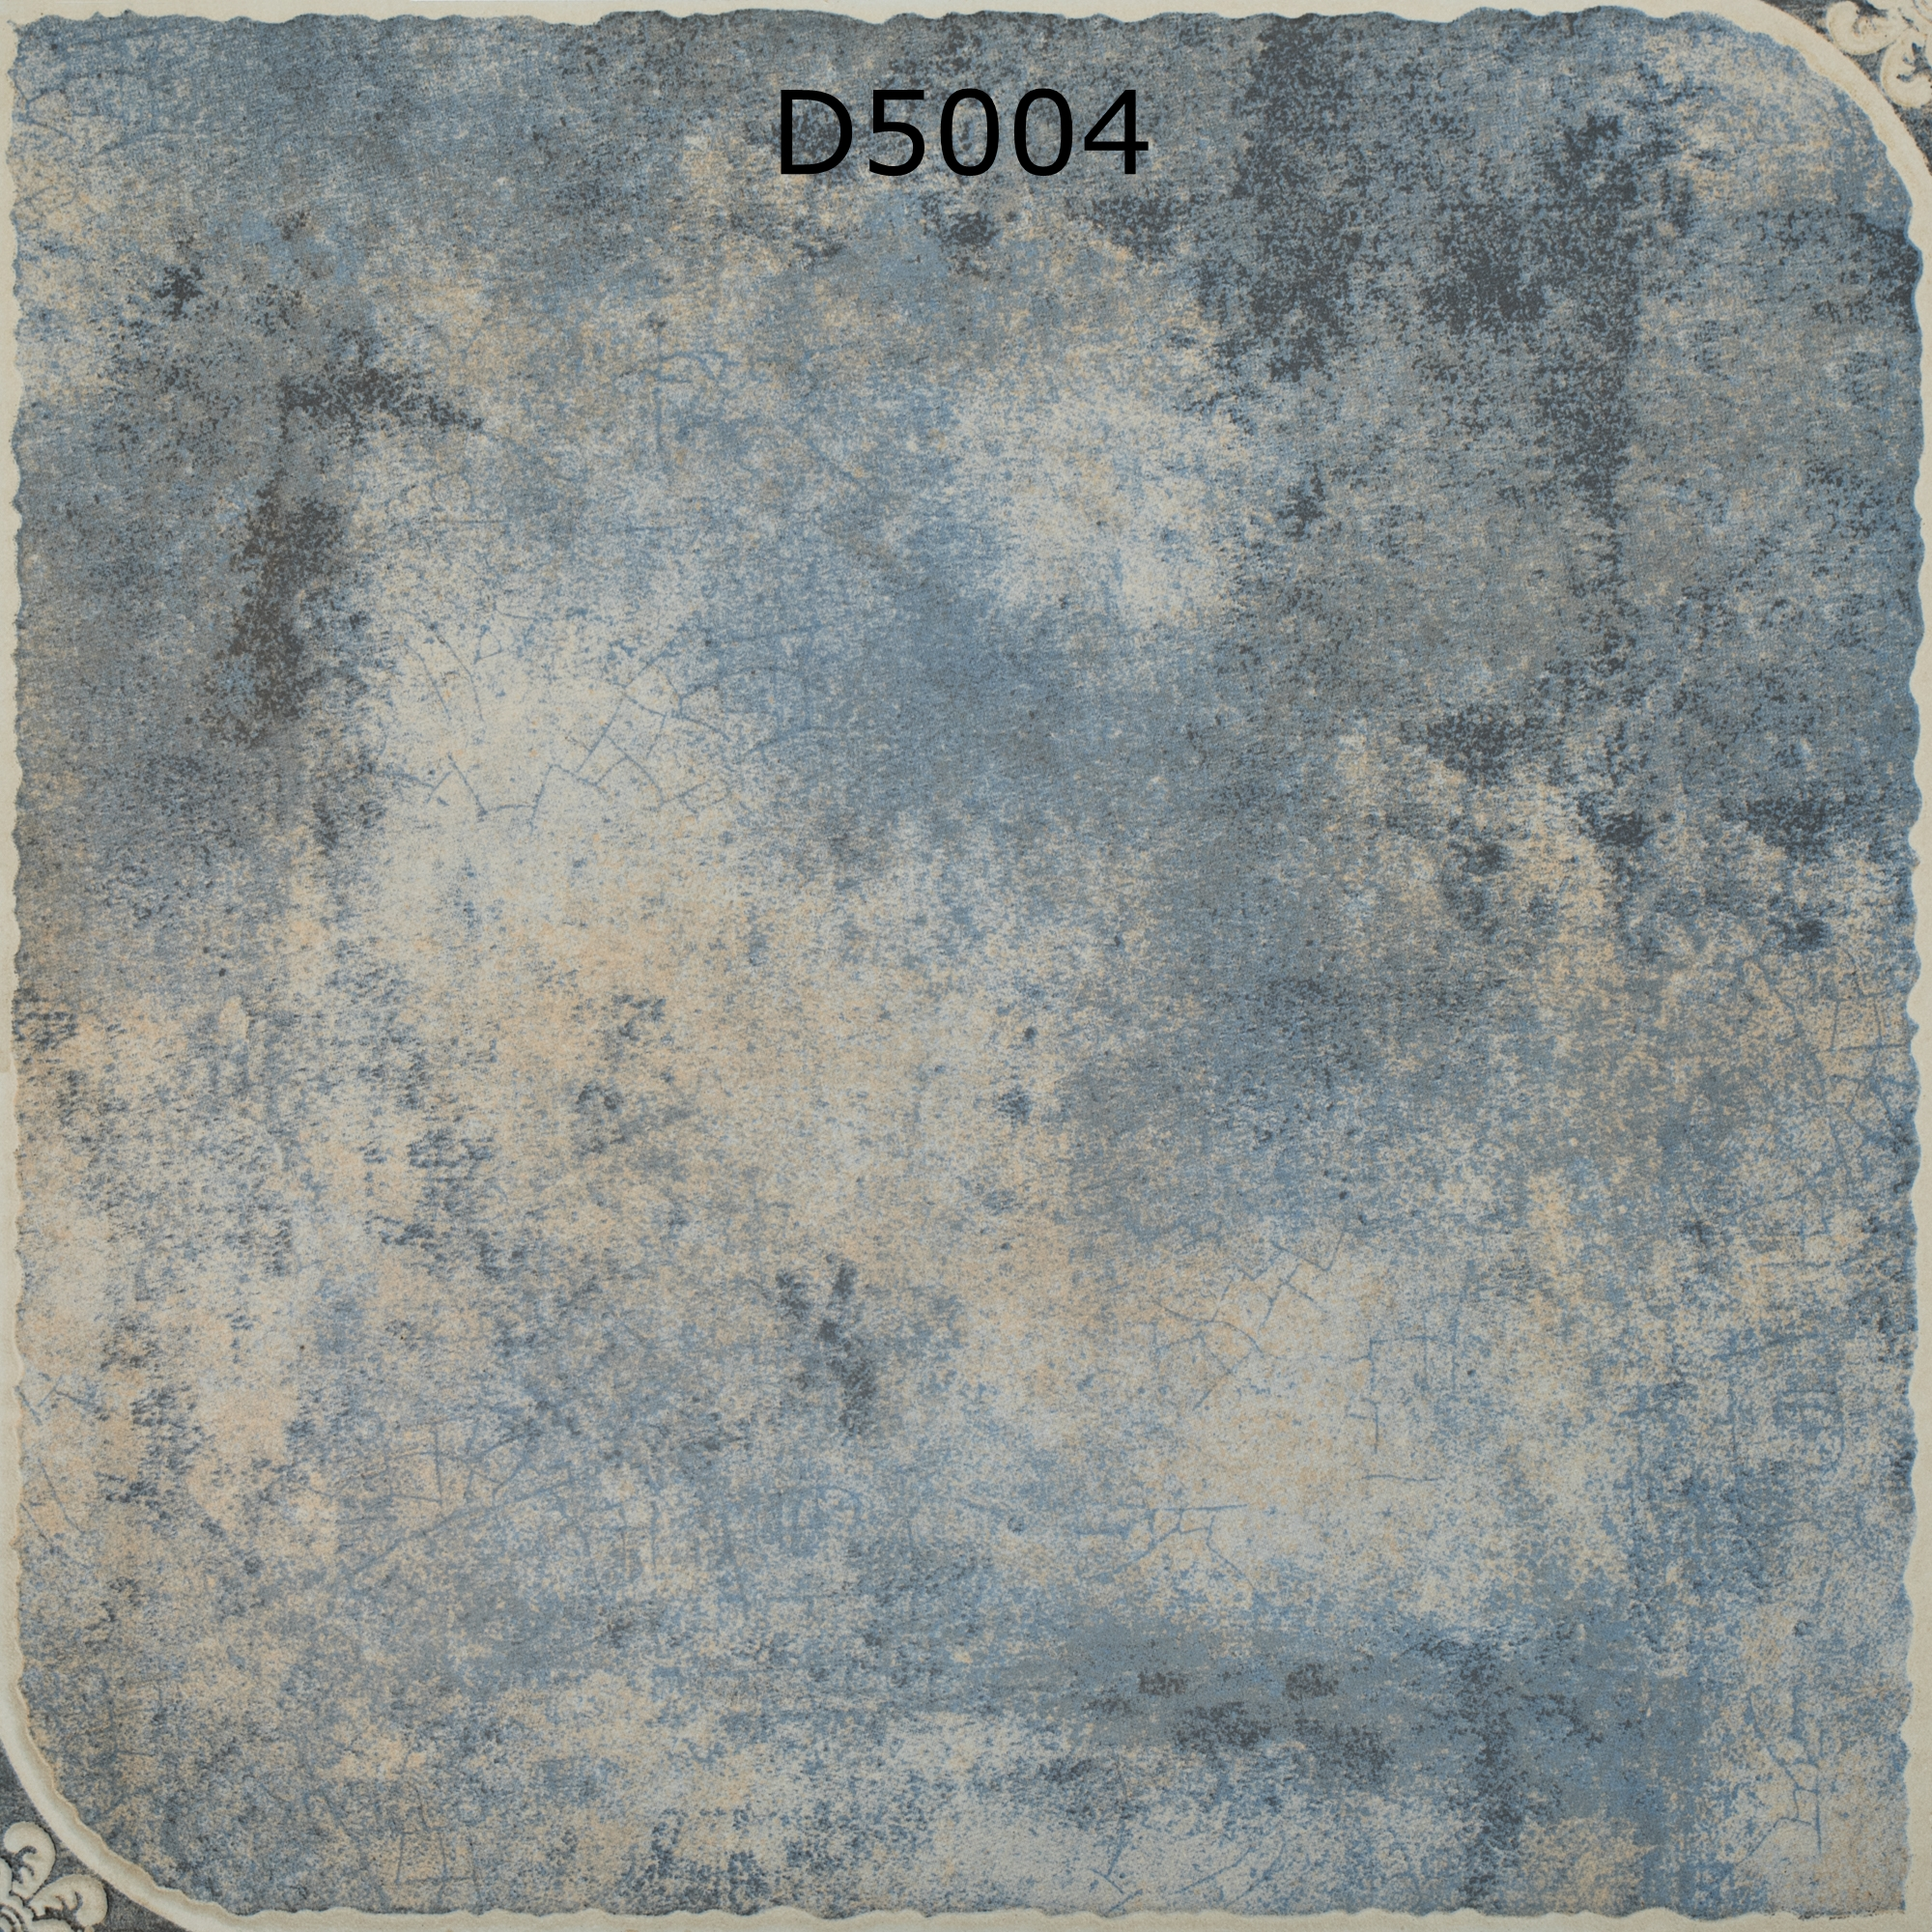 D5004